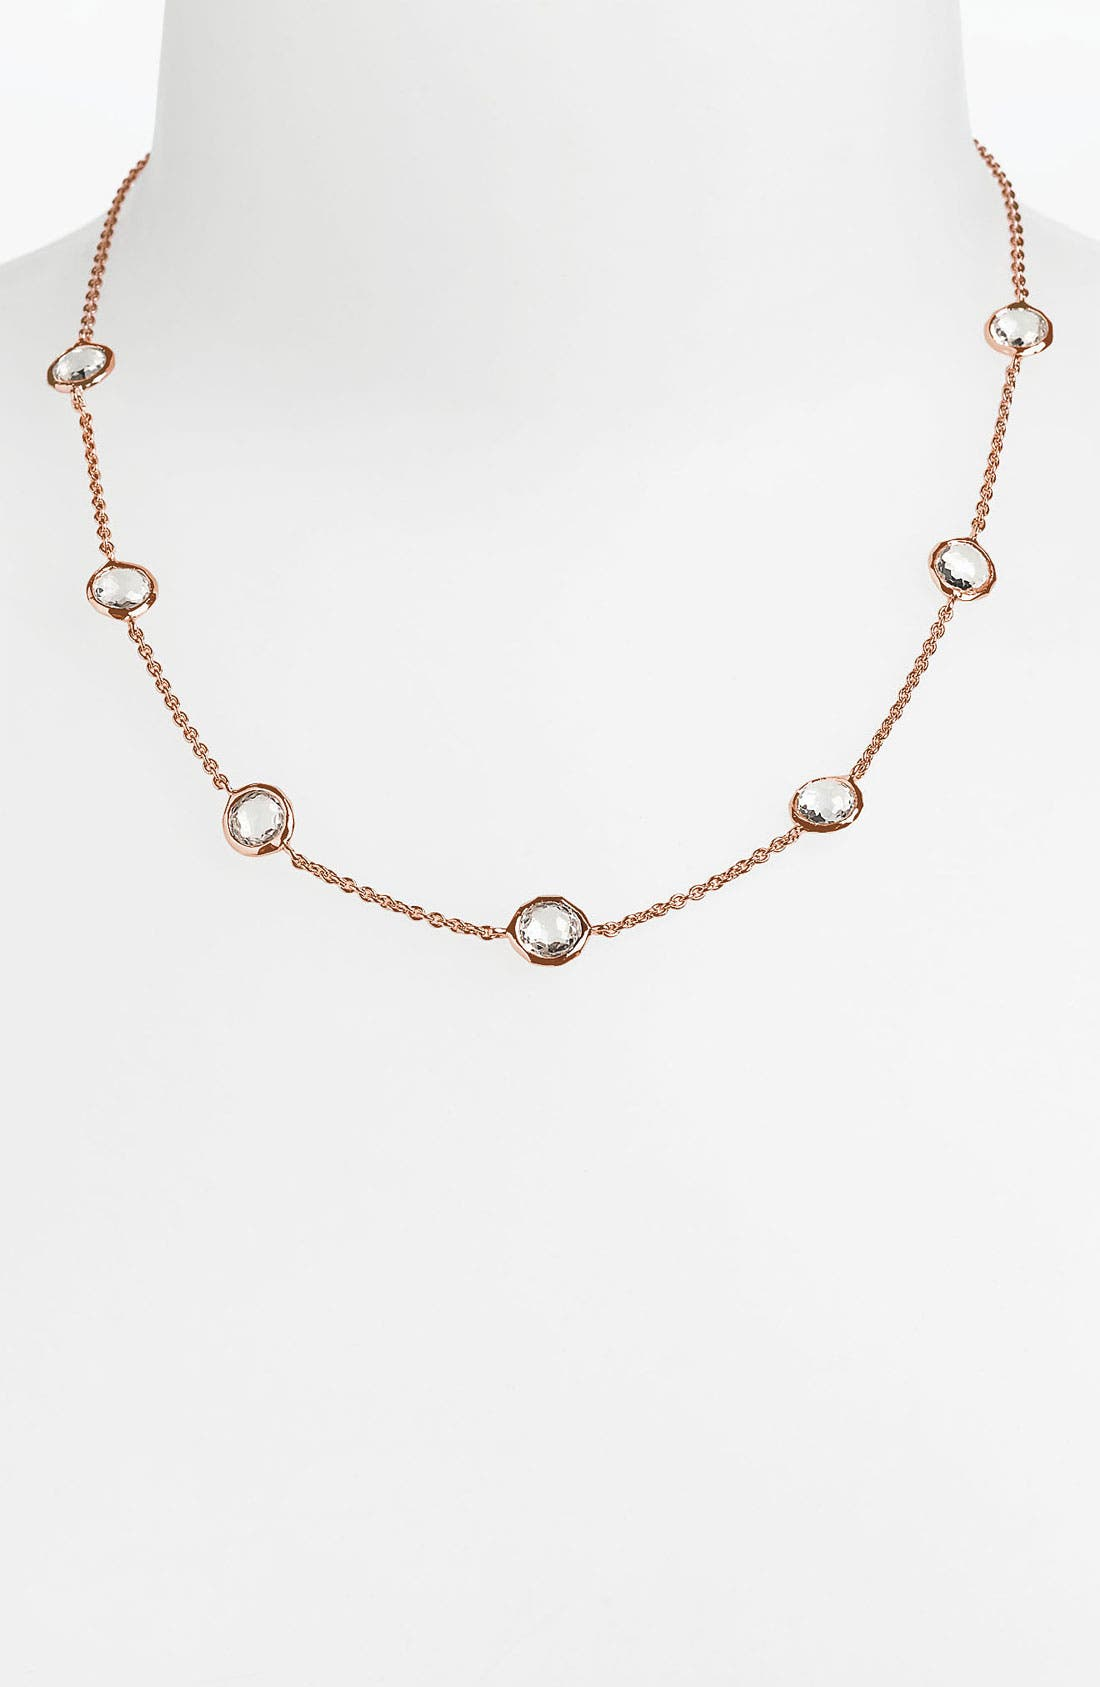 Alternate Image 1 Selected - Ippolita 'Rock Candy' 7-Station Lollipop Rosé Necklace